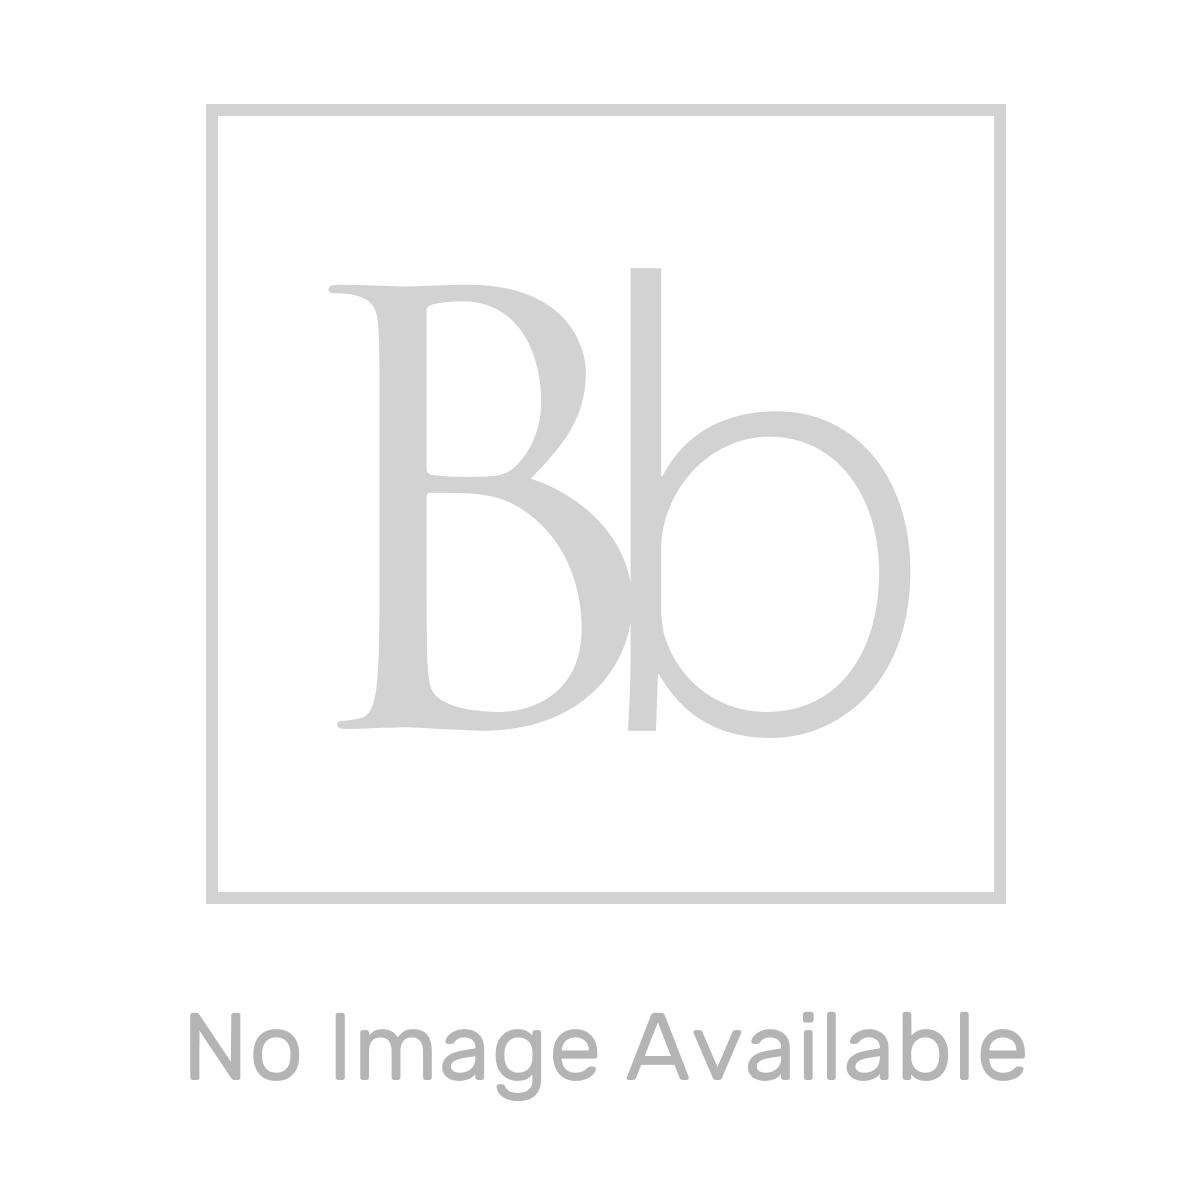 RAK Series 600 Close Coupled Toilet  Line Drawing